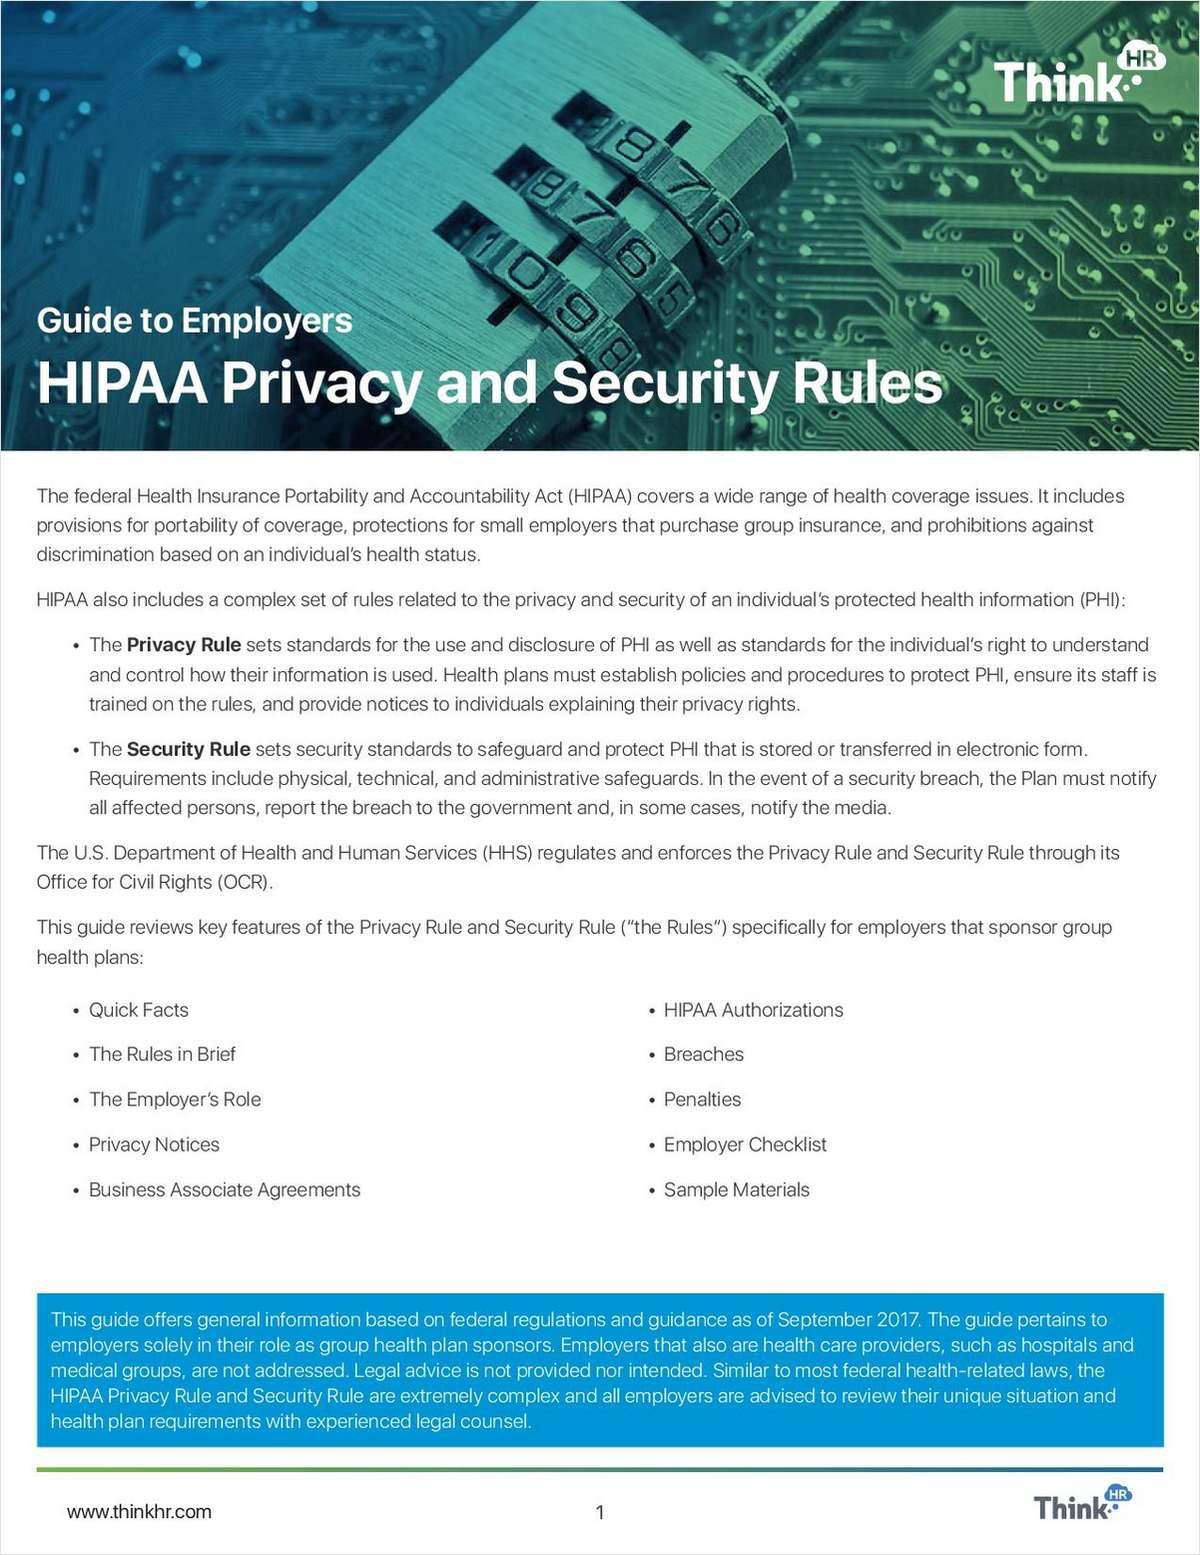 Broker Tool: Help Clients Understand Updated HIPAA Rules